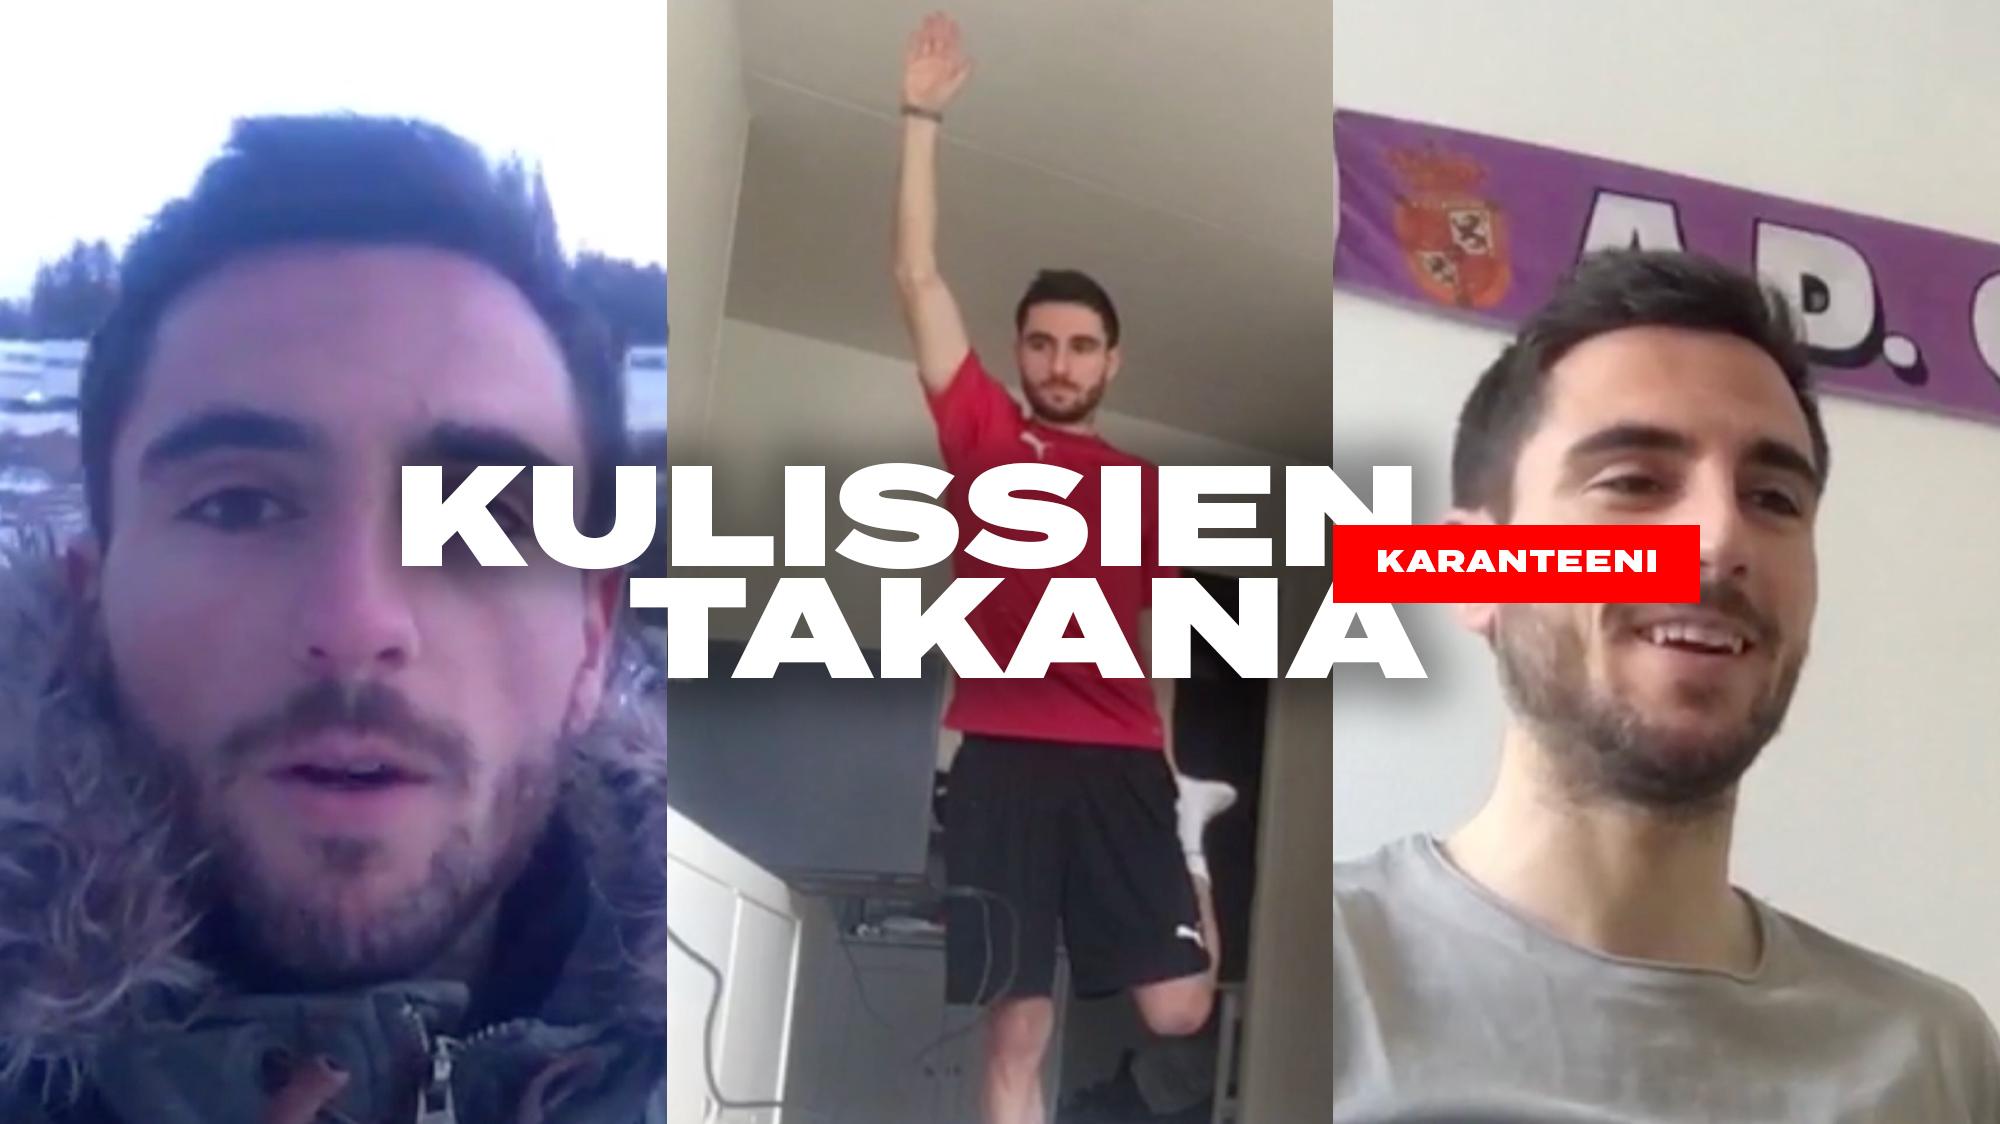 Kulissien takana: Karanteeni | Pipe Sáez